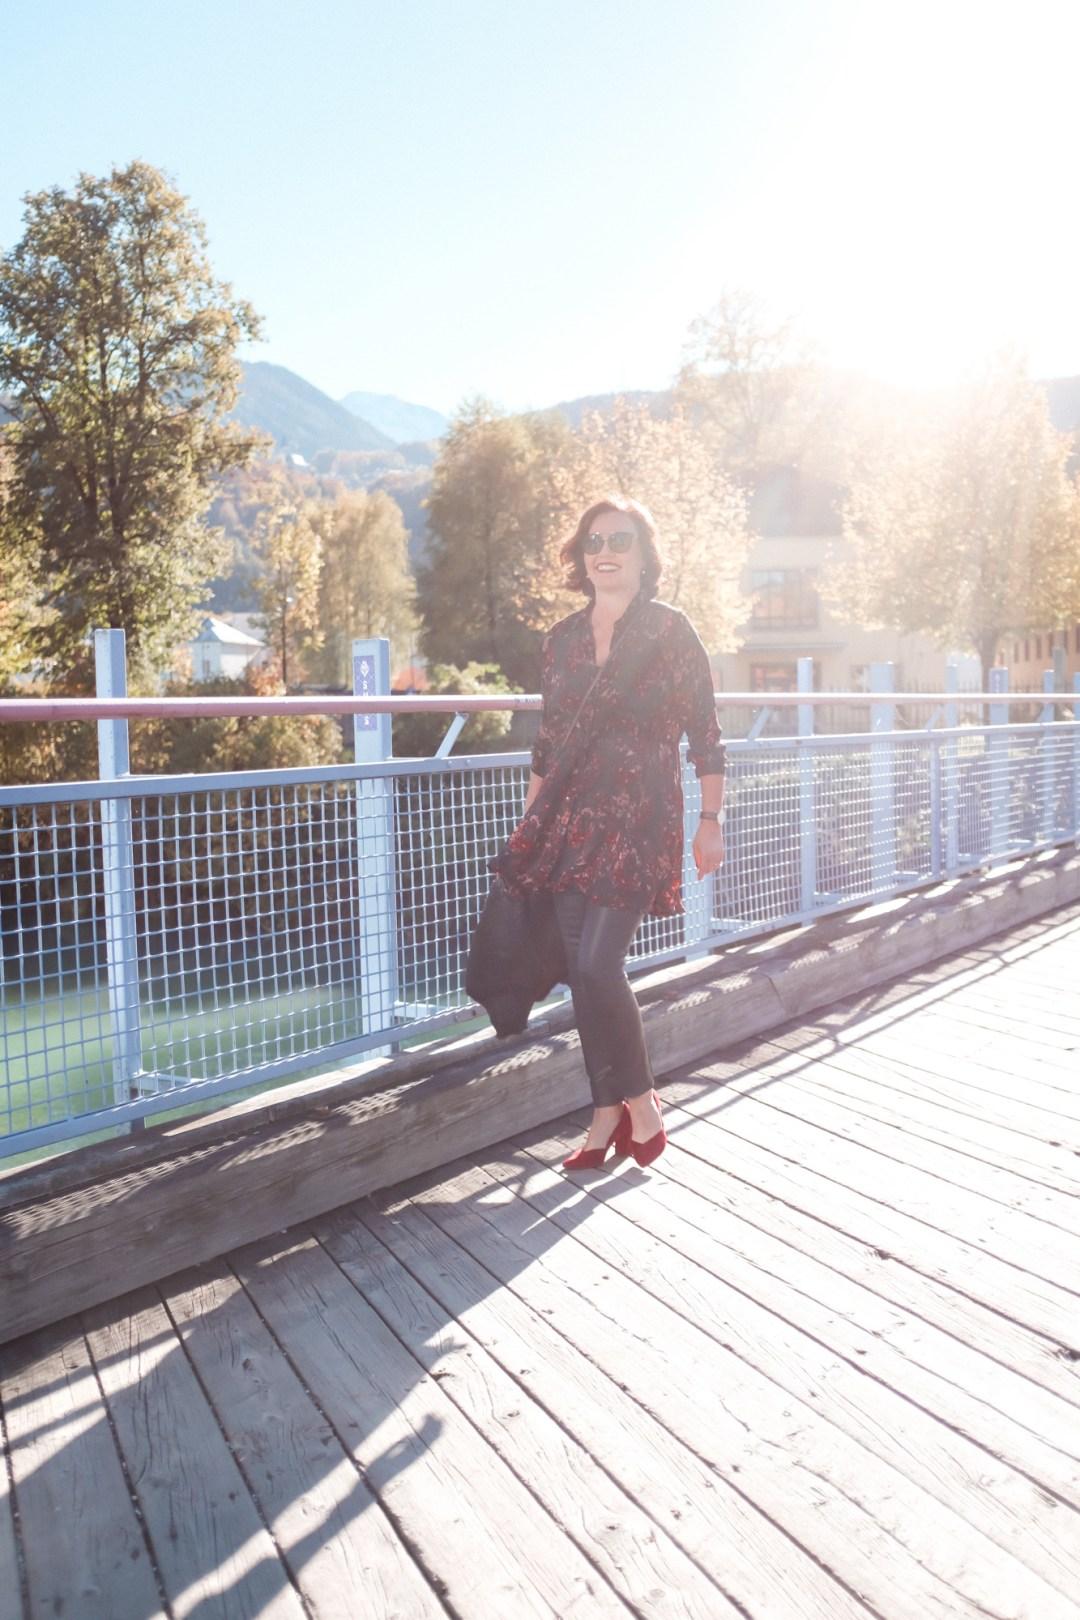 DSCF9897.herbstmode fashionista over50 modeblogger